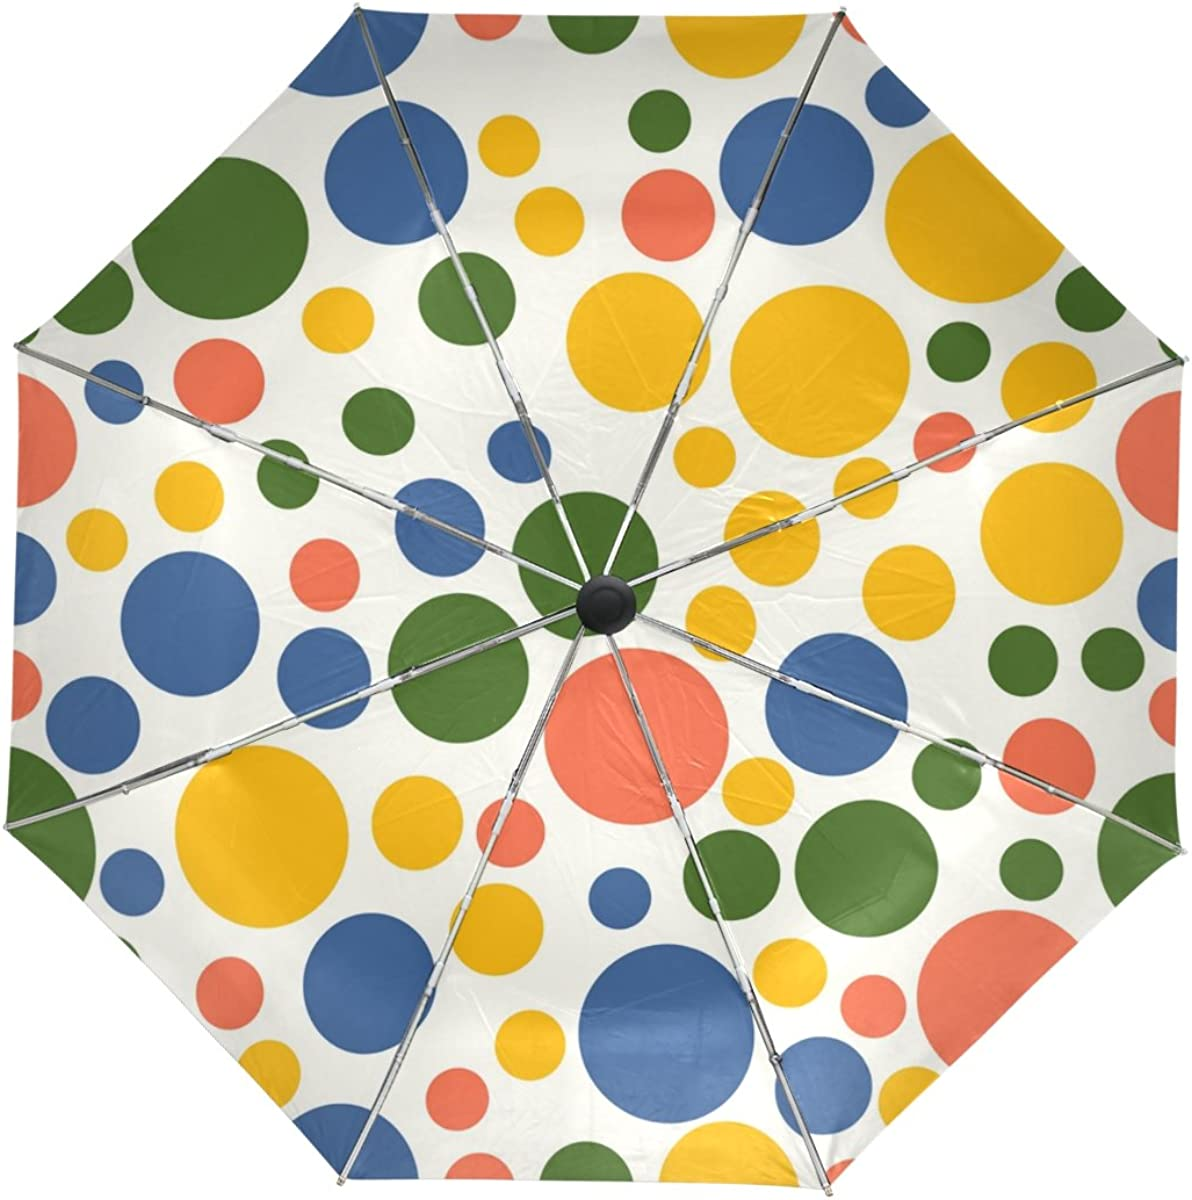 Custom Green Polka Dots Pattern Compact Travel Windproof Rainproof Foldable Umbrella